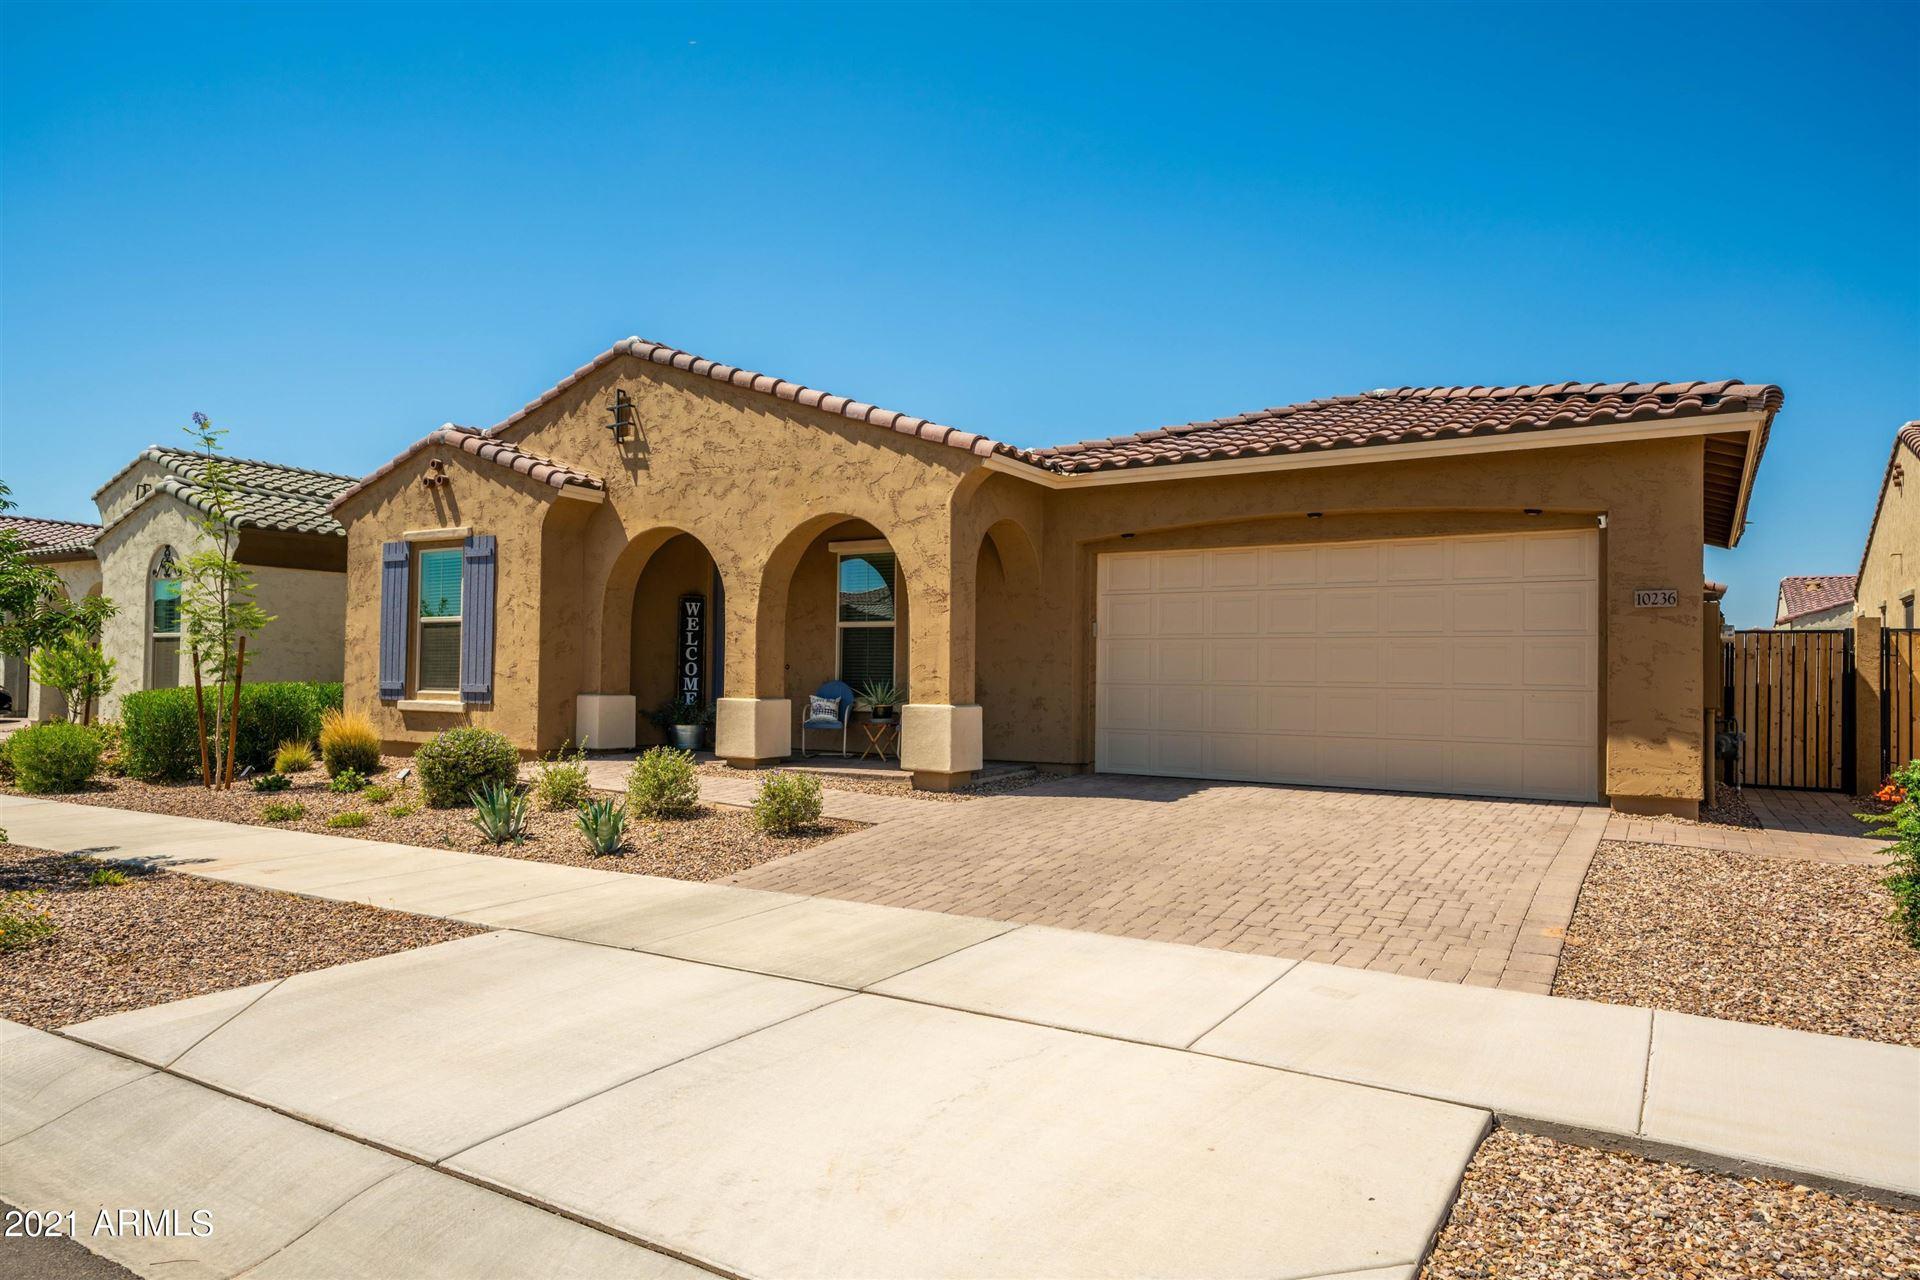 10236 E TIGER LILY Avenue, Mesa, AZ 85212 - MLS#: 6241292